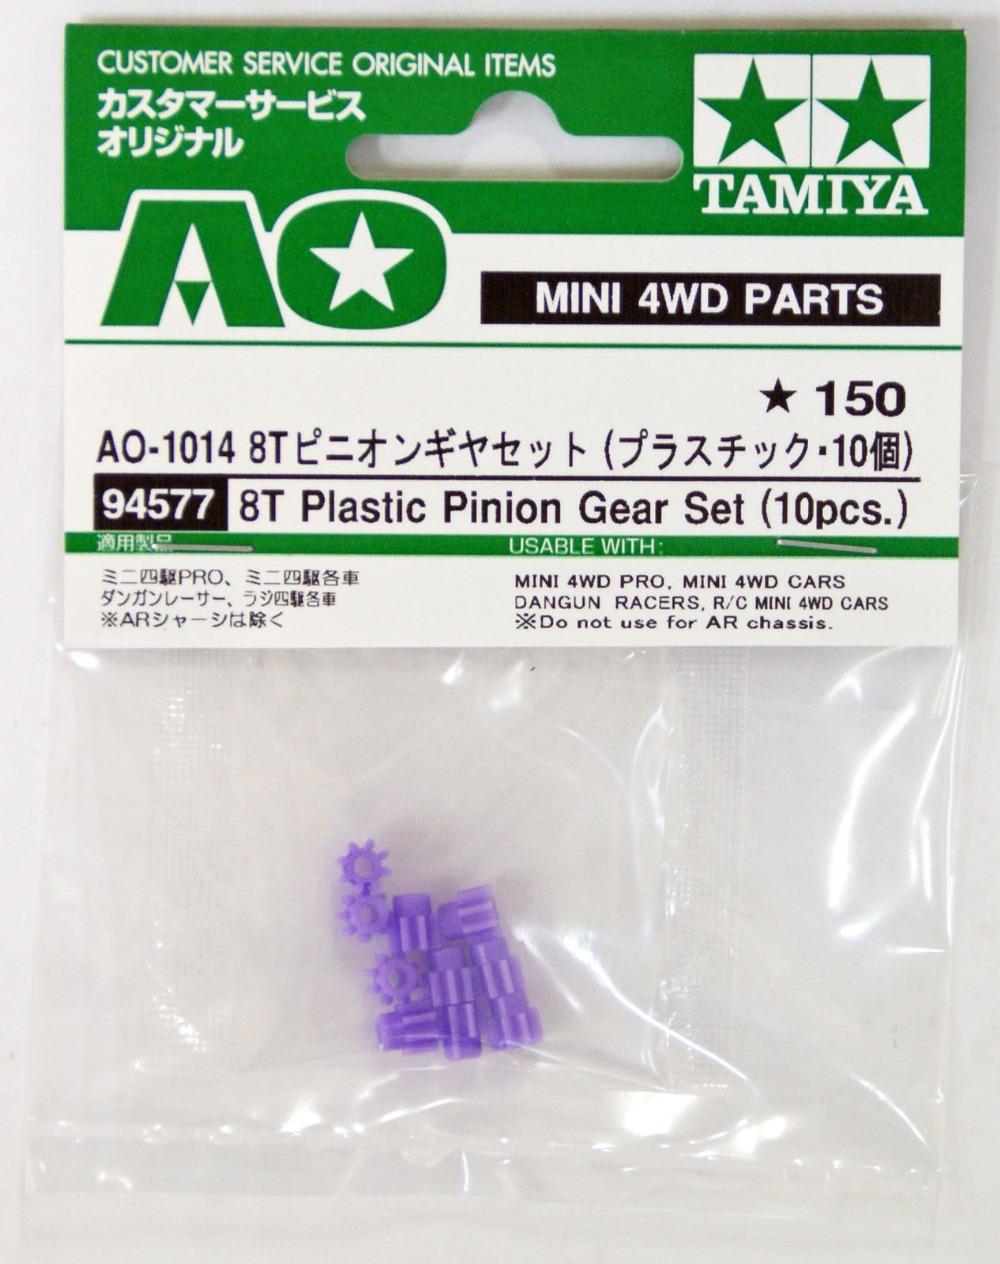 8T Plastic Pinion Gear*10